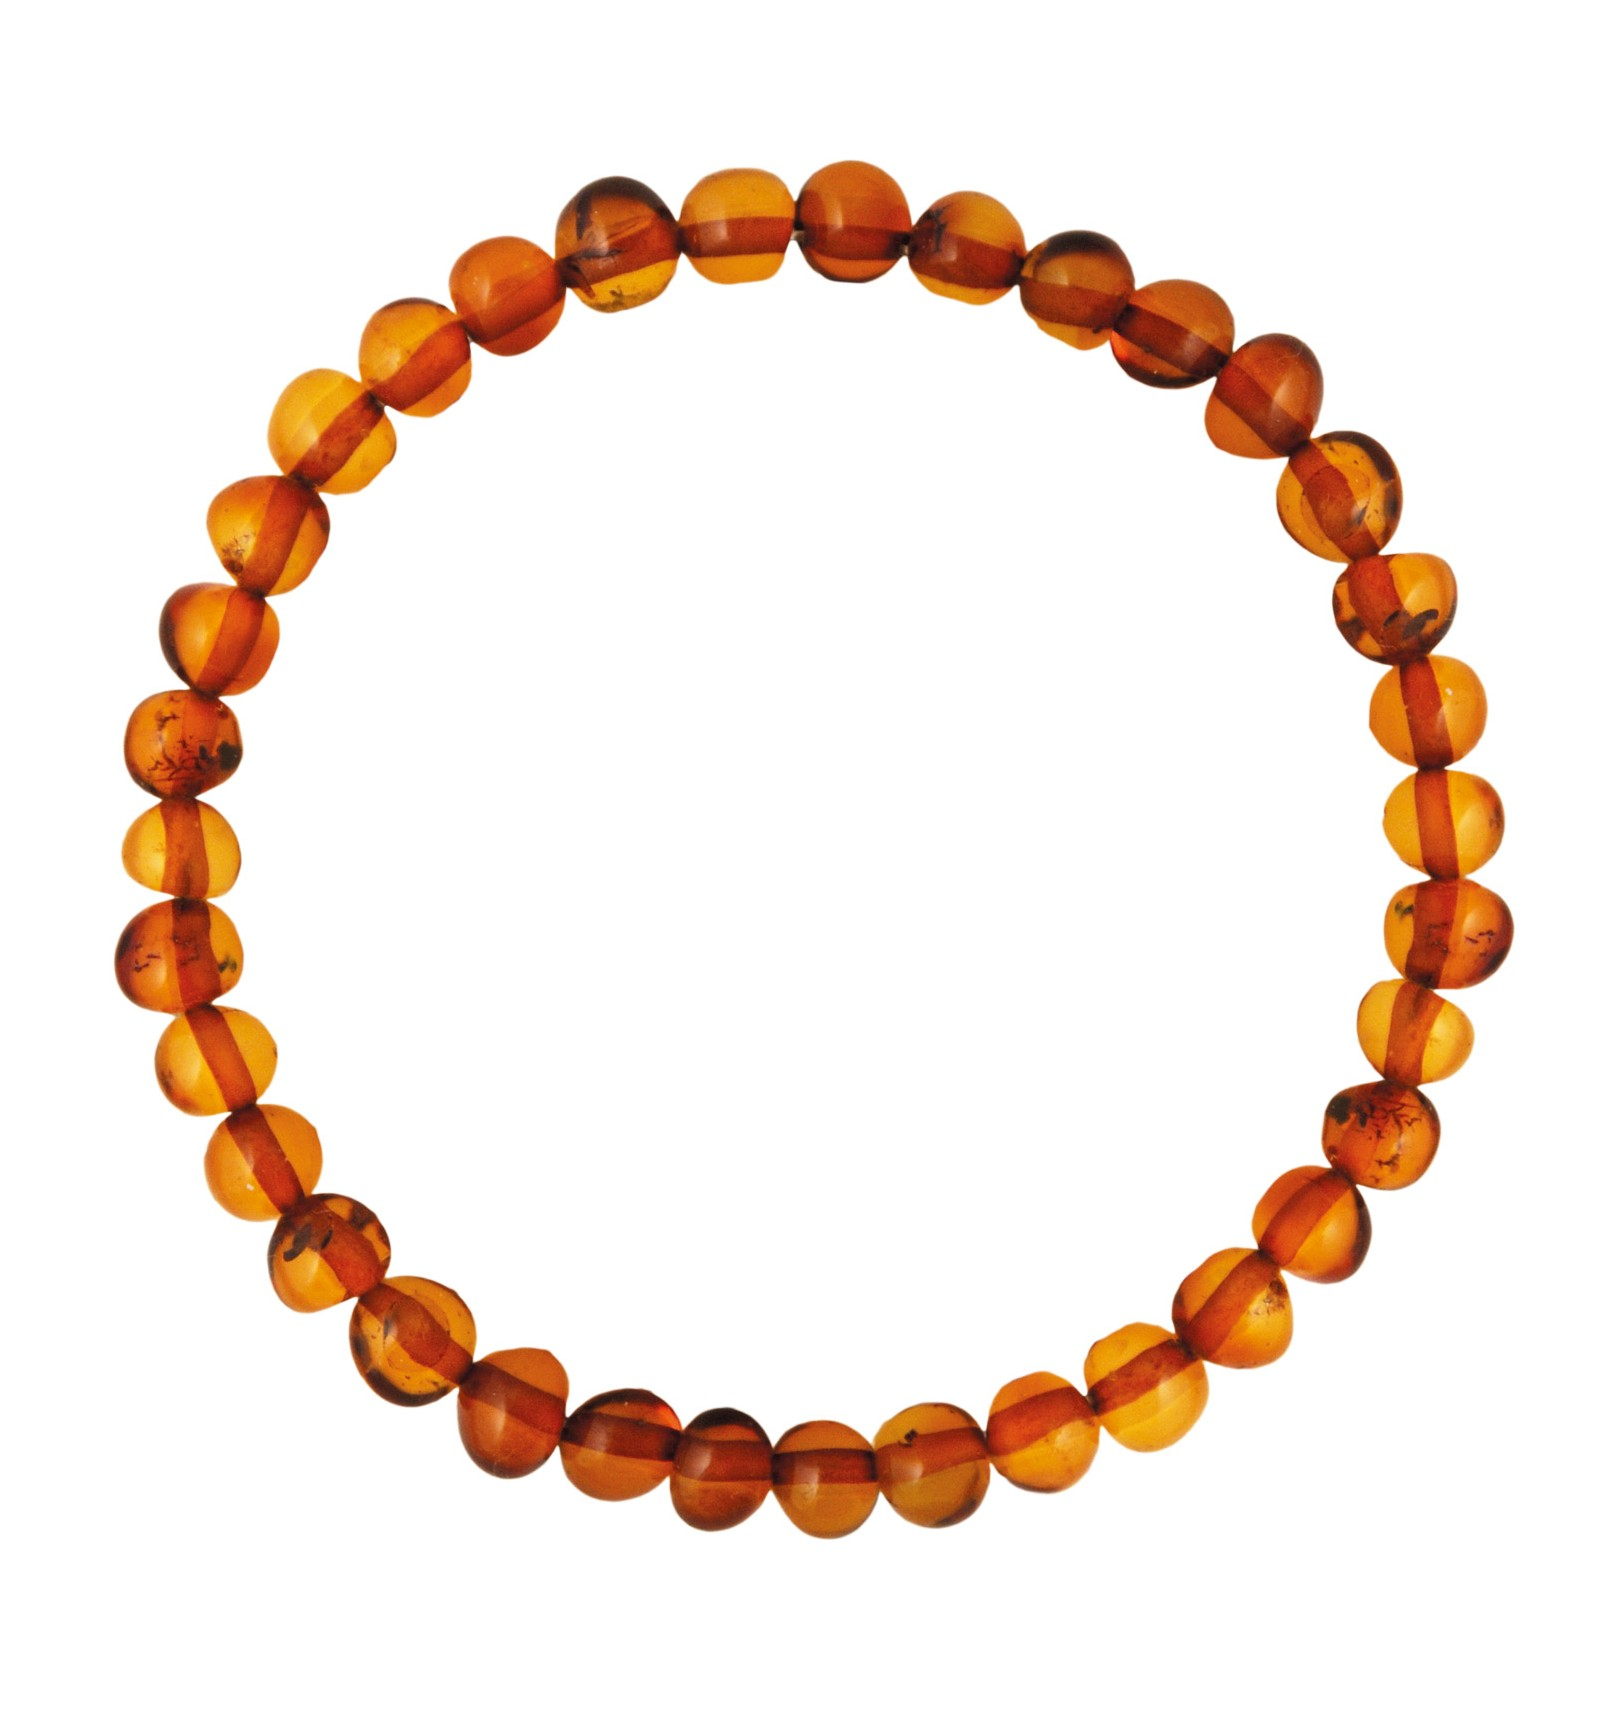 bracelet en perles d 39 ambre diffusion rosicrucienne. Black Bedroom Furniture Sets. Home Design Ideas